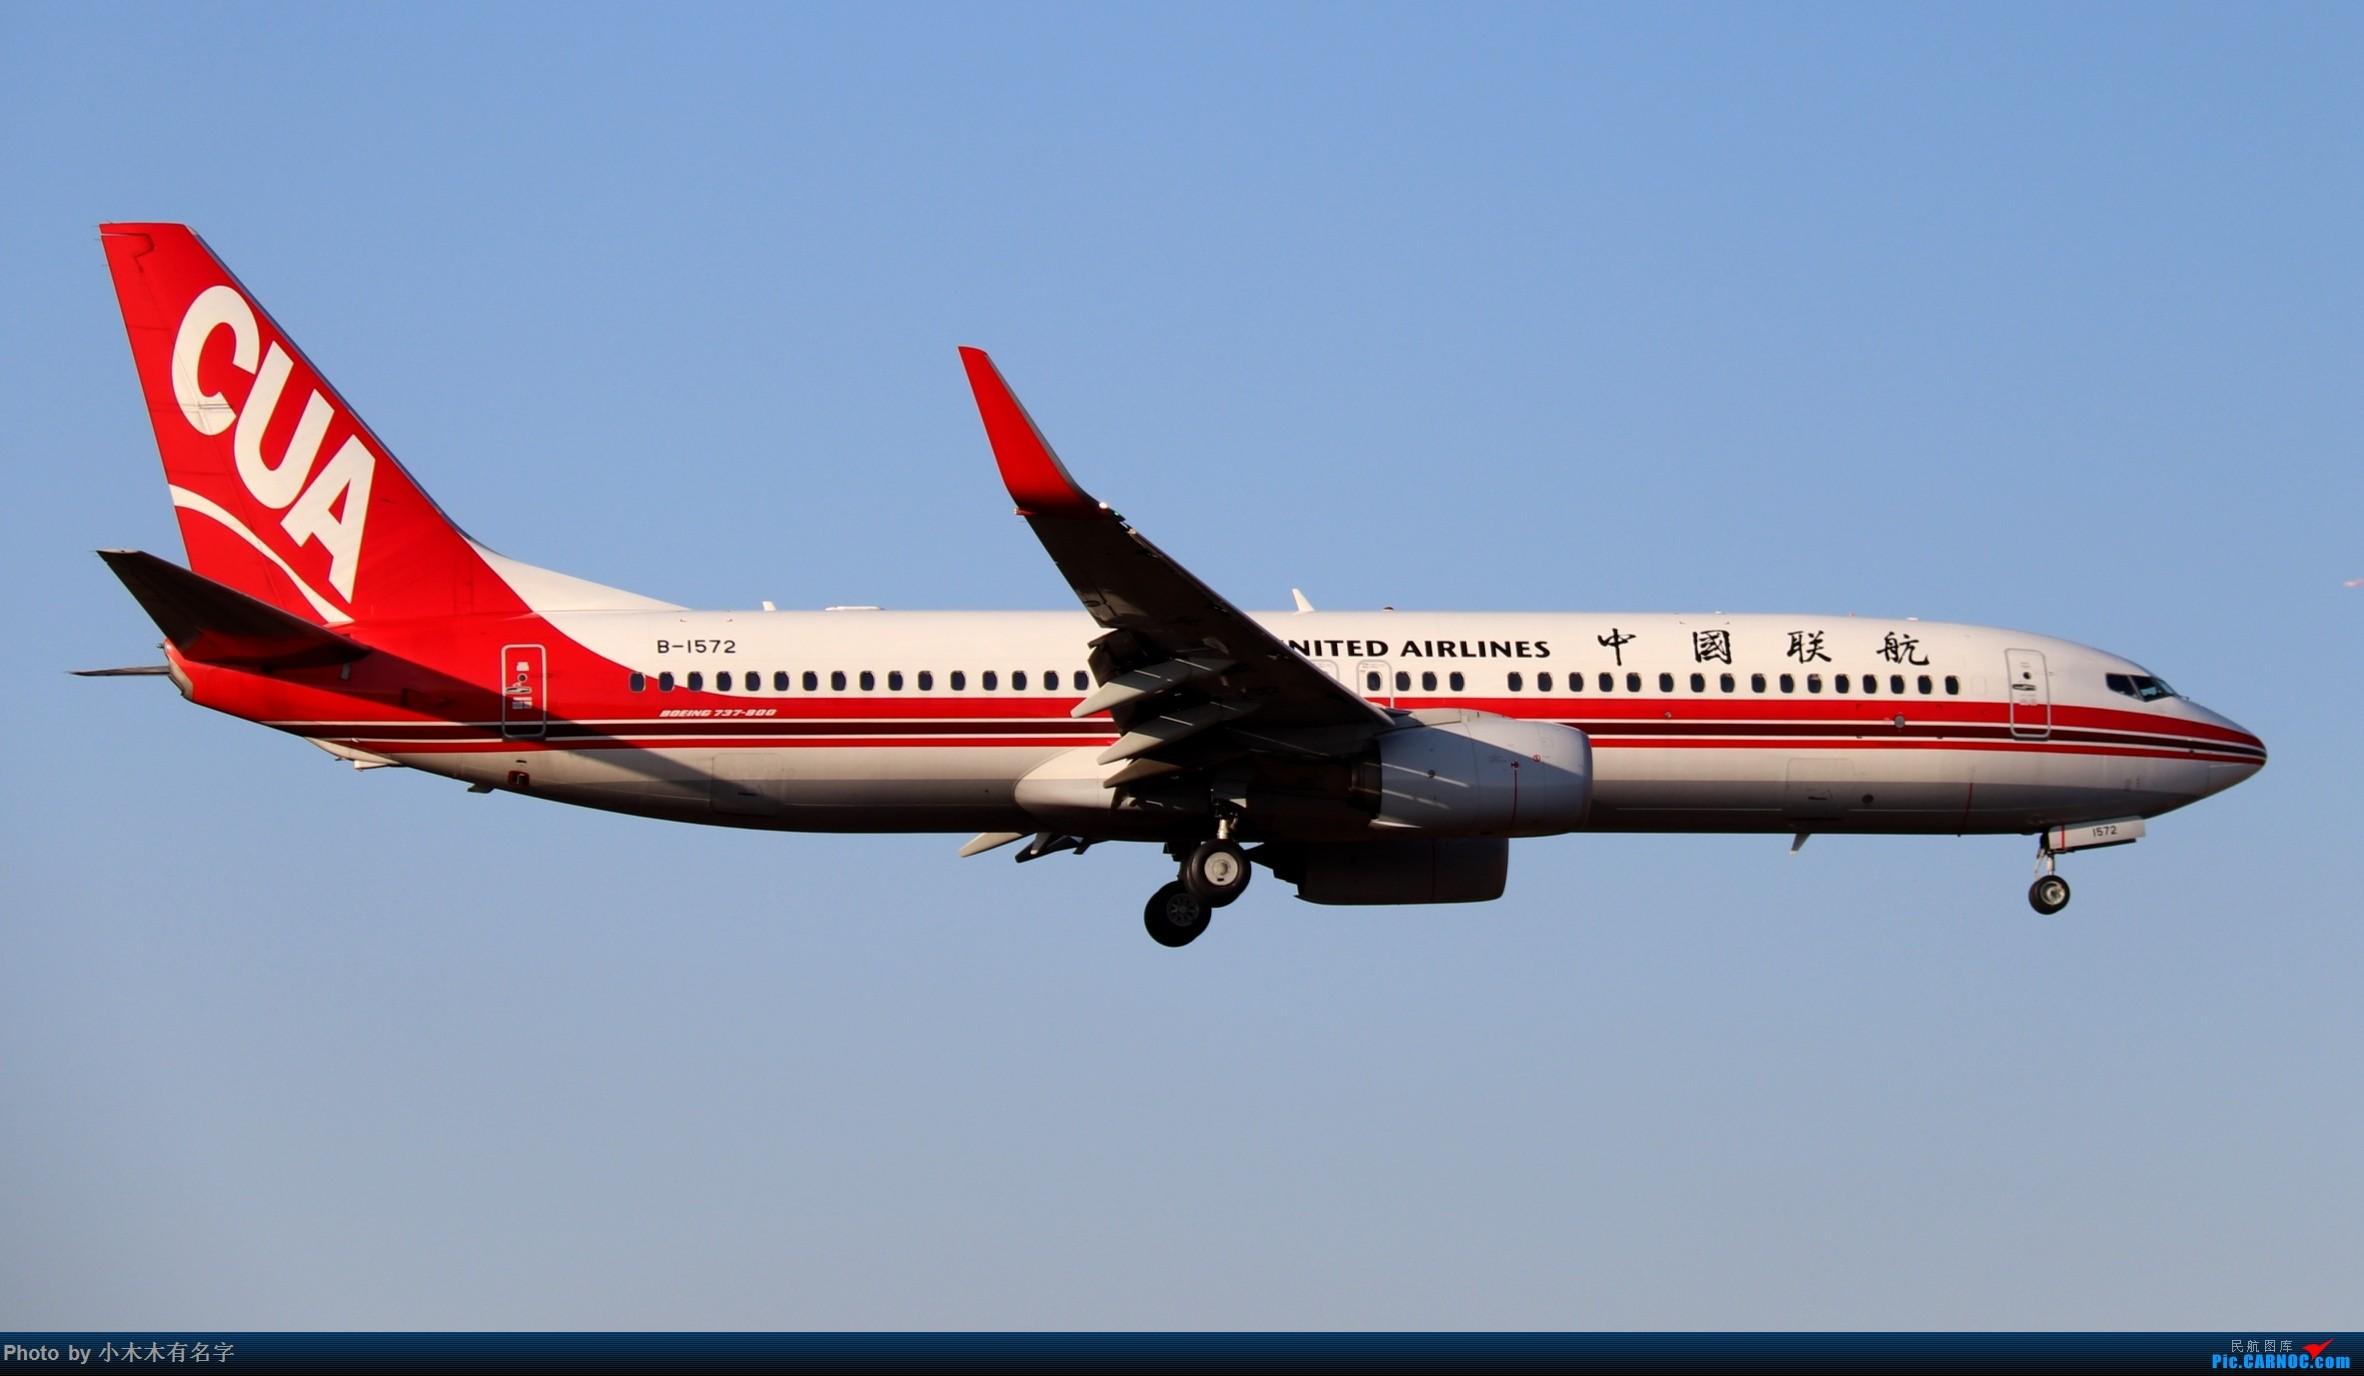 Re:[原创]2019冬天的海口美兰 BOEING 737-800 B-1572 中国海口美兰国际机场